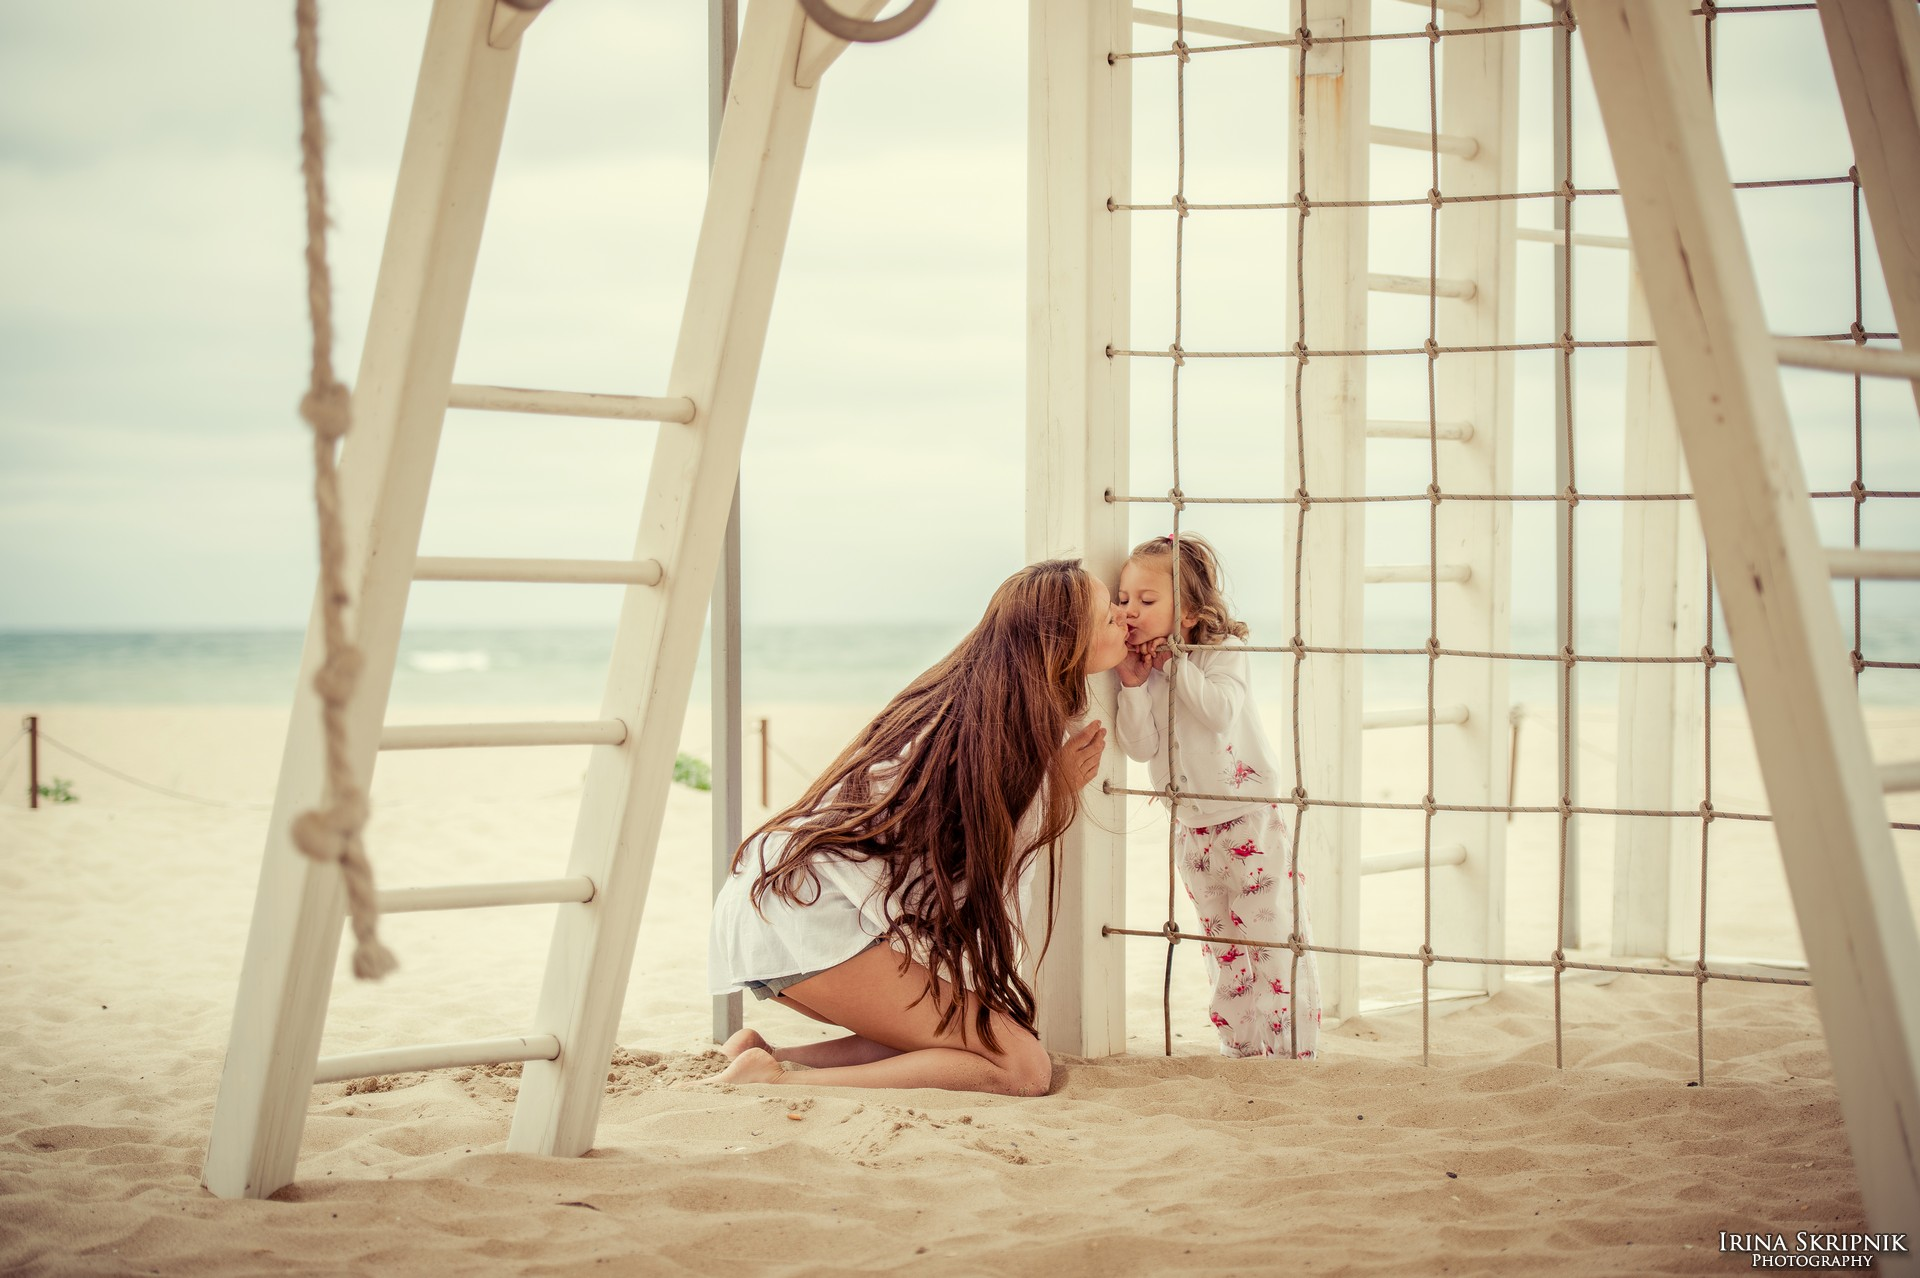 Irina Skripnik Photography 20147